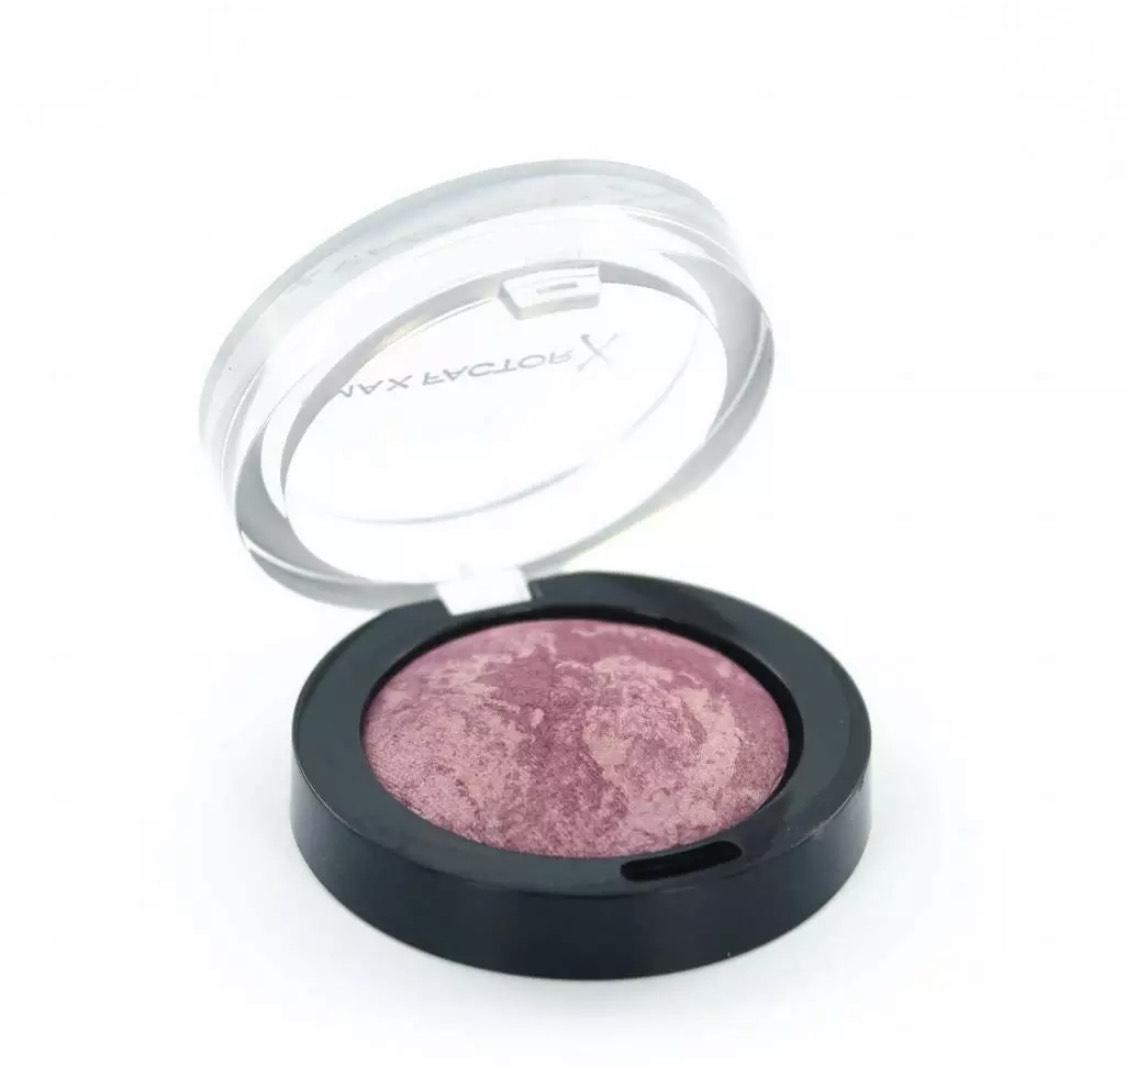 Max Factor X Creme Puff Blush (Purple) 10p instore @ B&M (Spalding)